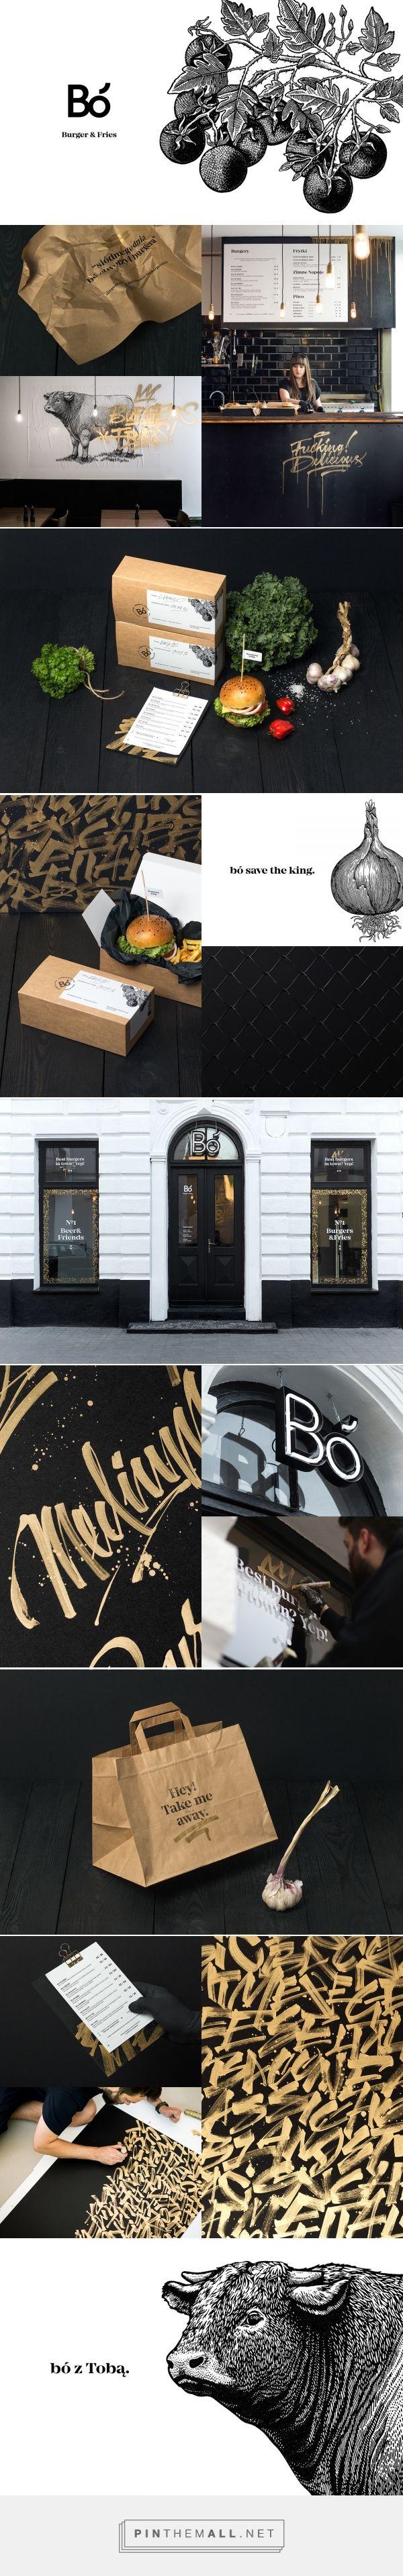 restaurants inspiration / branding   Bo Burger and Fries Restaurant Branding and Menu Design by Hopa Studio